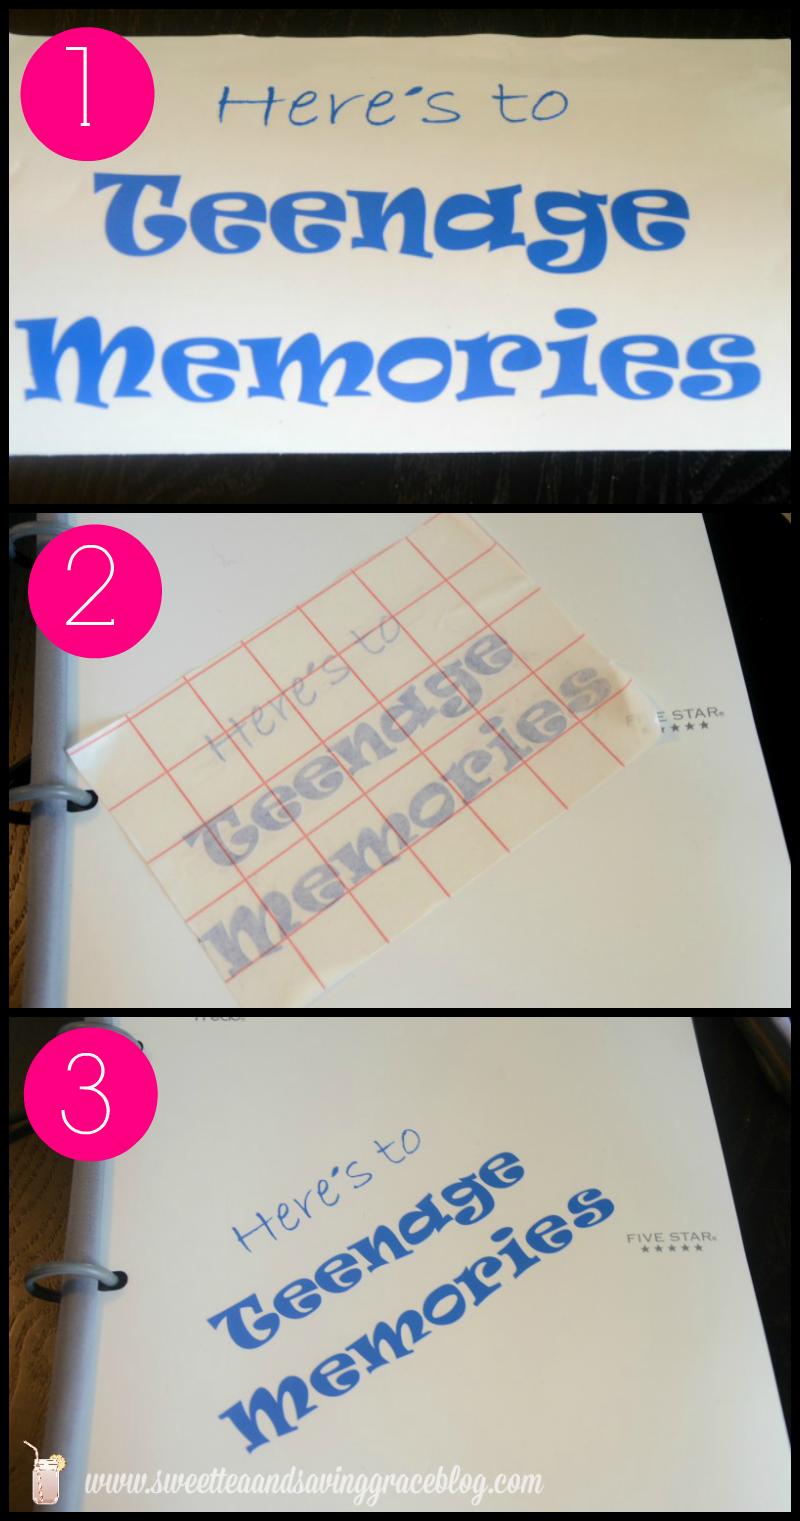 Personalized Notebooks     Sweet Tea & Saving Grace